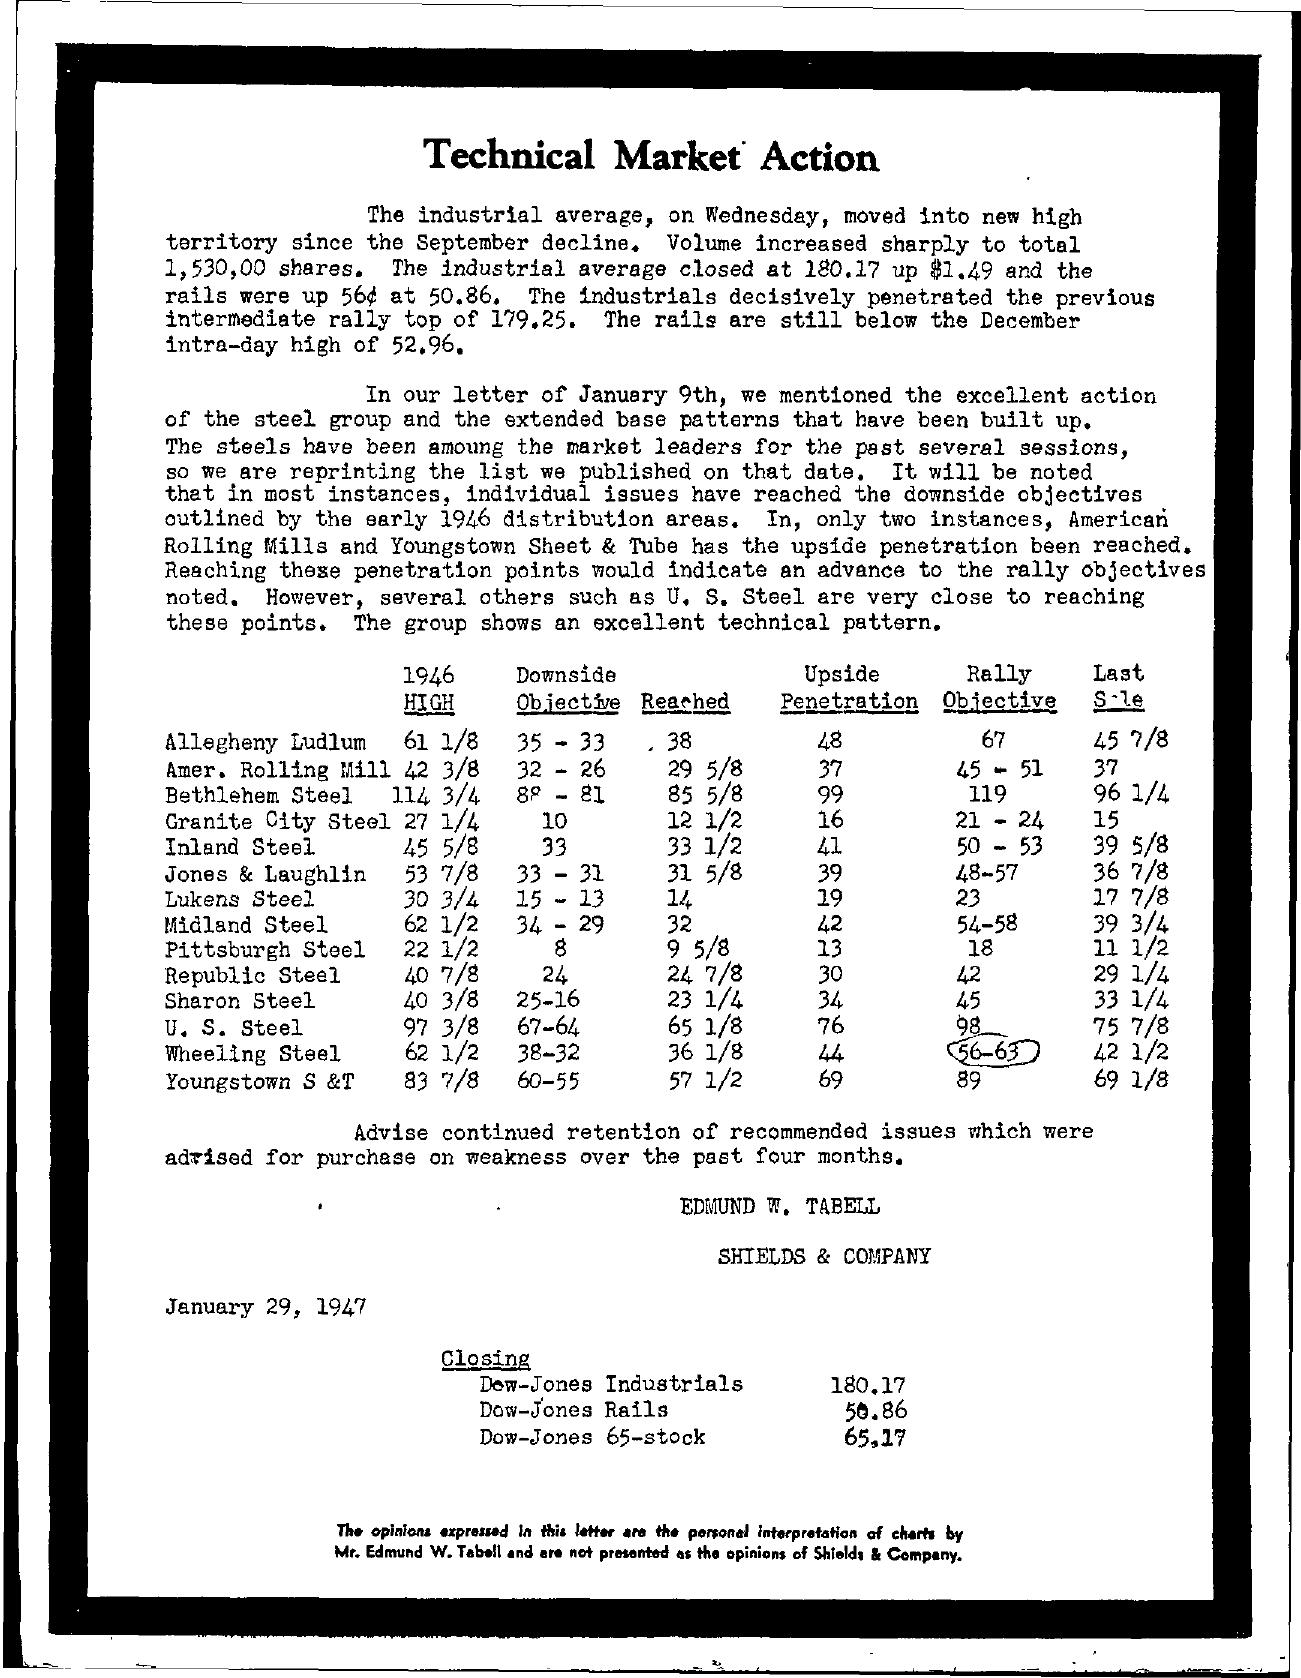 Tabell's Market Letter - January 29, 1947